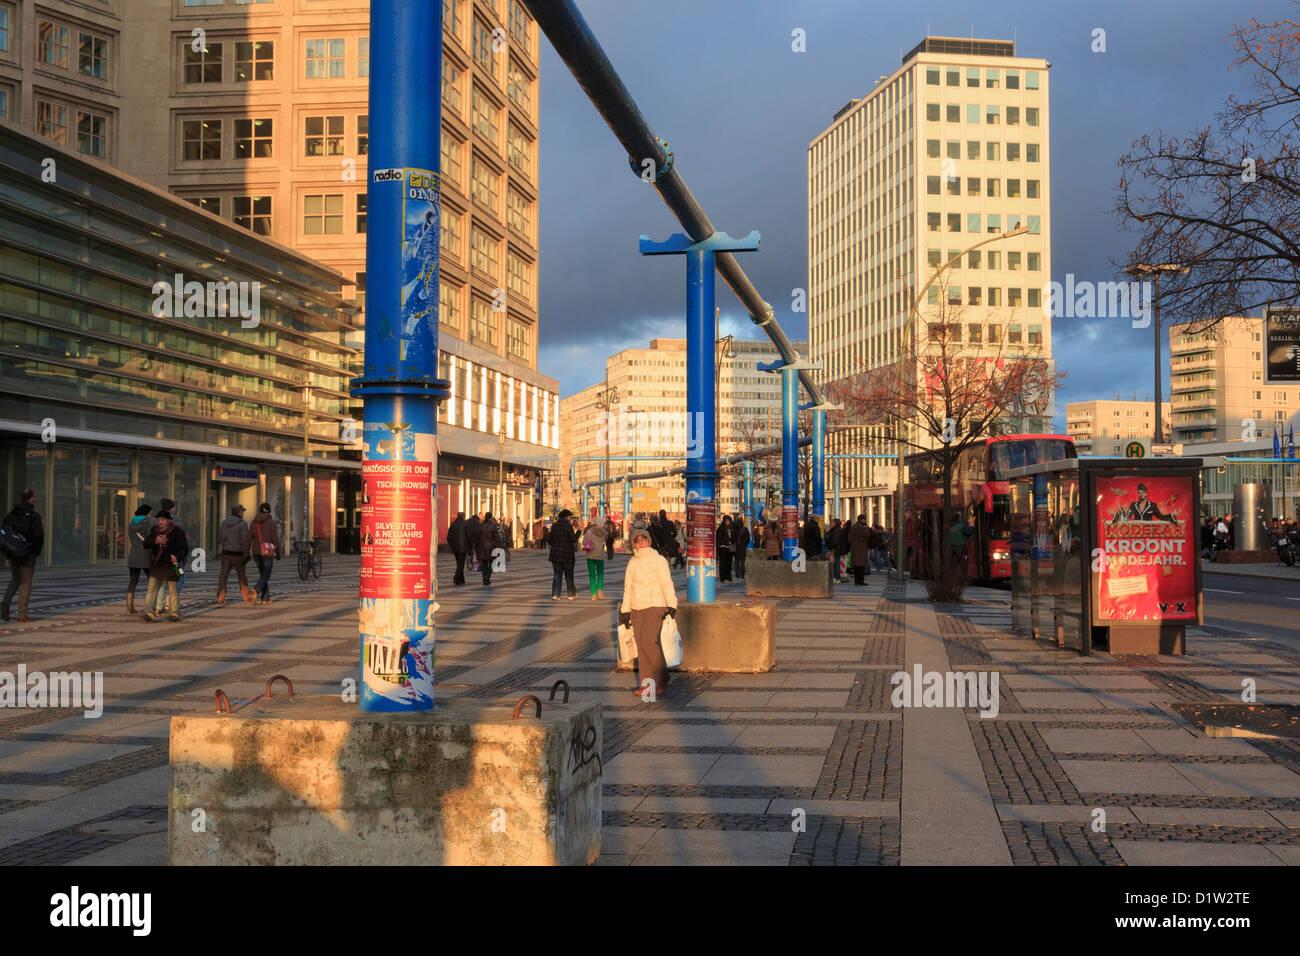 Street scene with overground pipes along Gruner Strasse, Alexanderplatz, Berlin Mitte, Germany, Europe - Stock Image